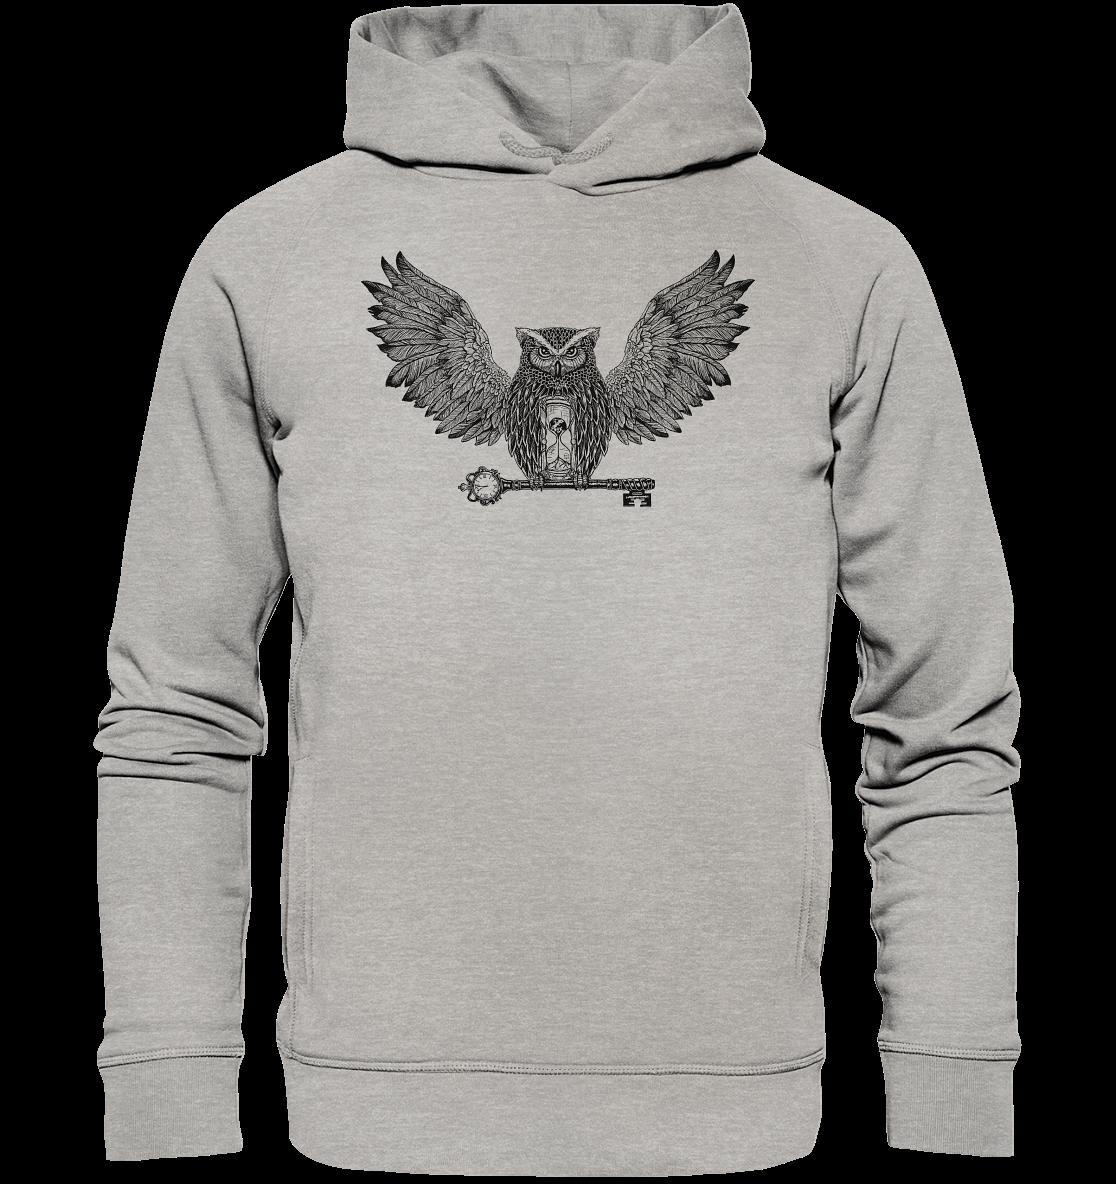 front-organic-fashion-hoodie-c2c1c0-1116x-5.png